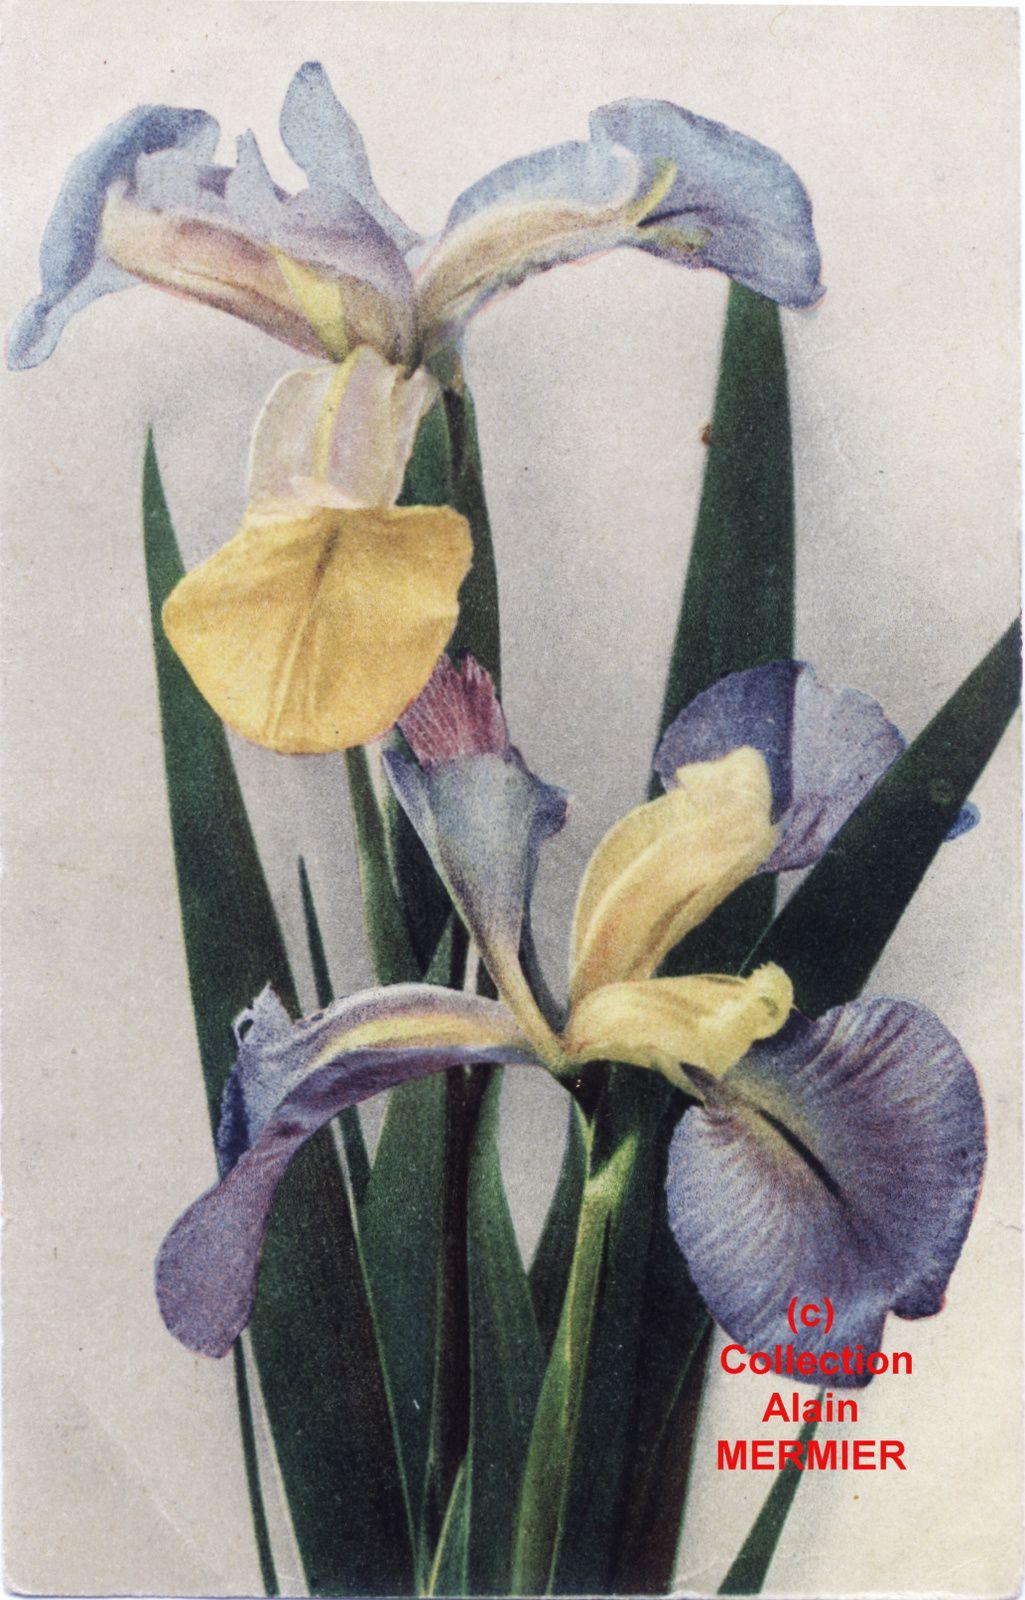 Iris -1916- Iris de Hollande. Dutch iris. 1921.